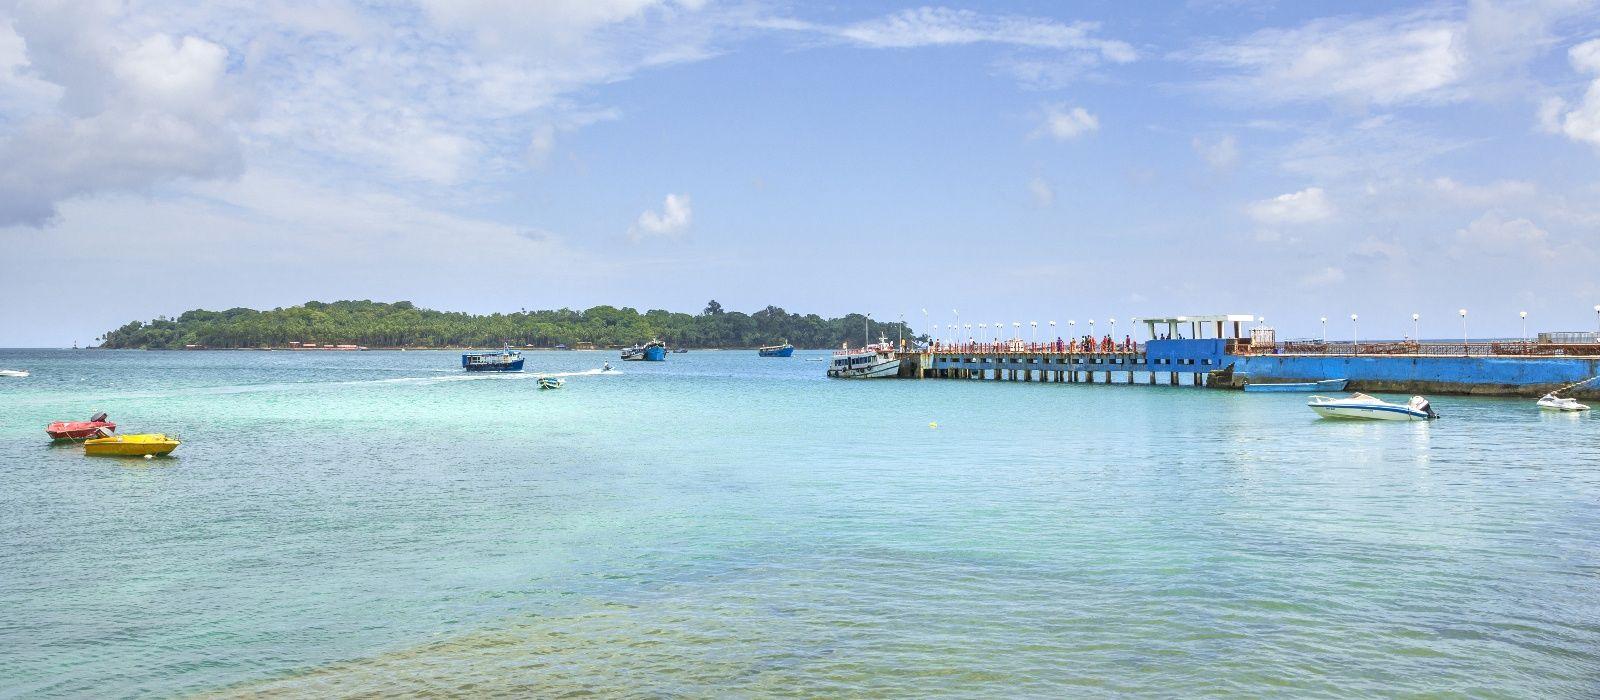 Destination Port Blair Islands & Beaches